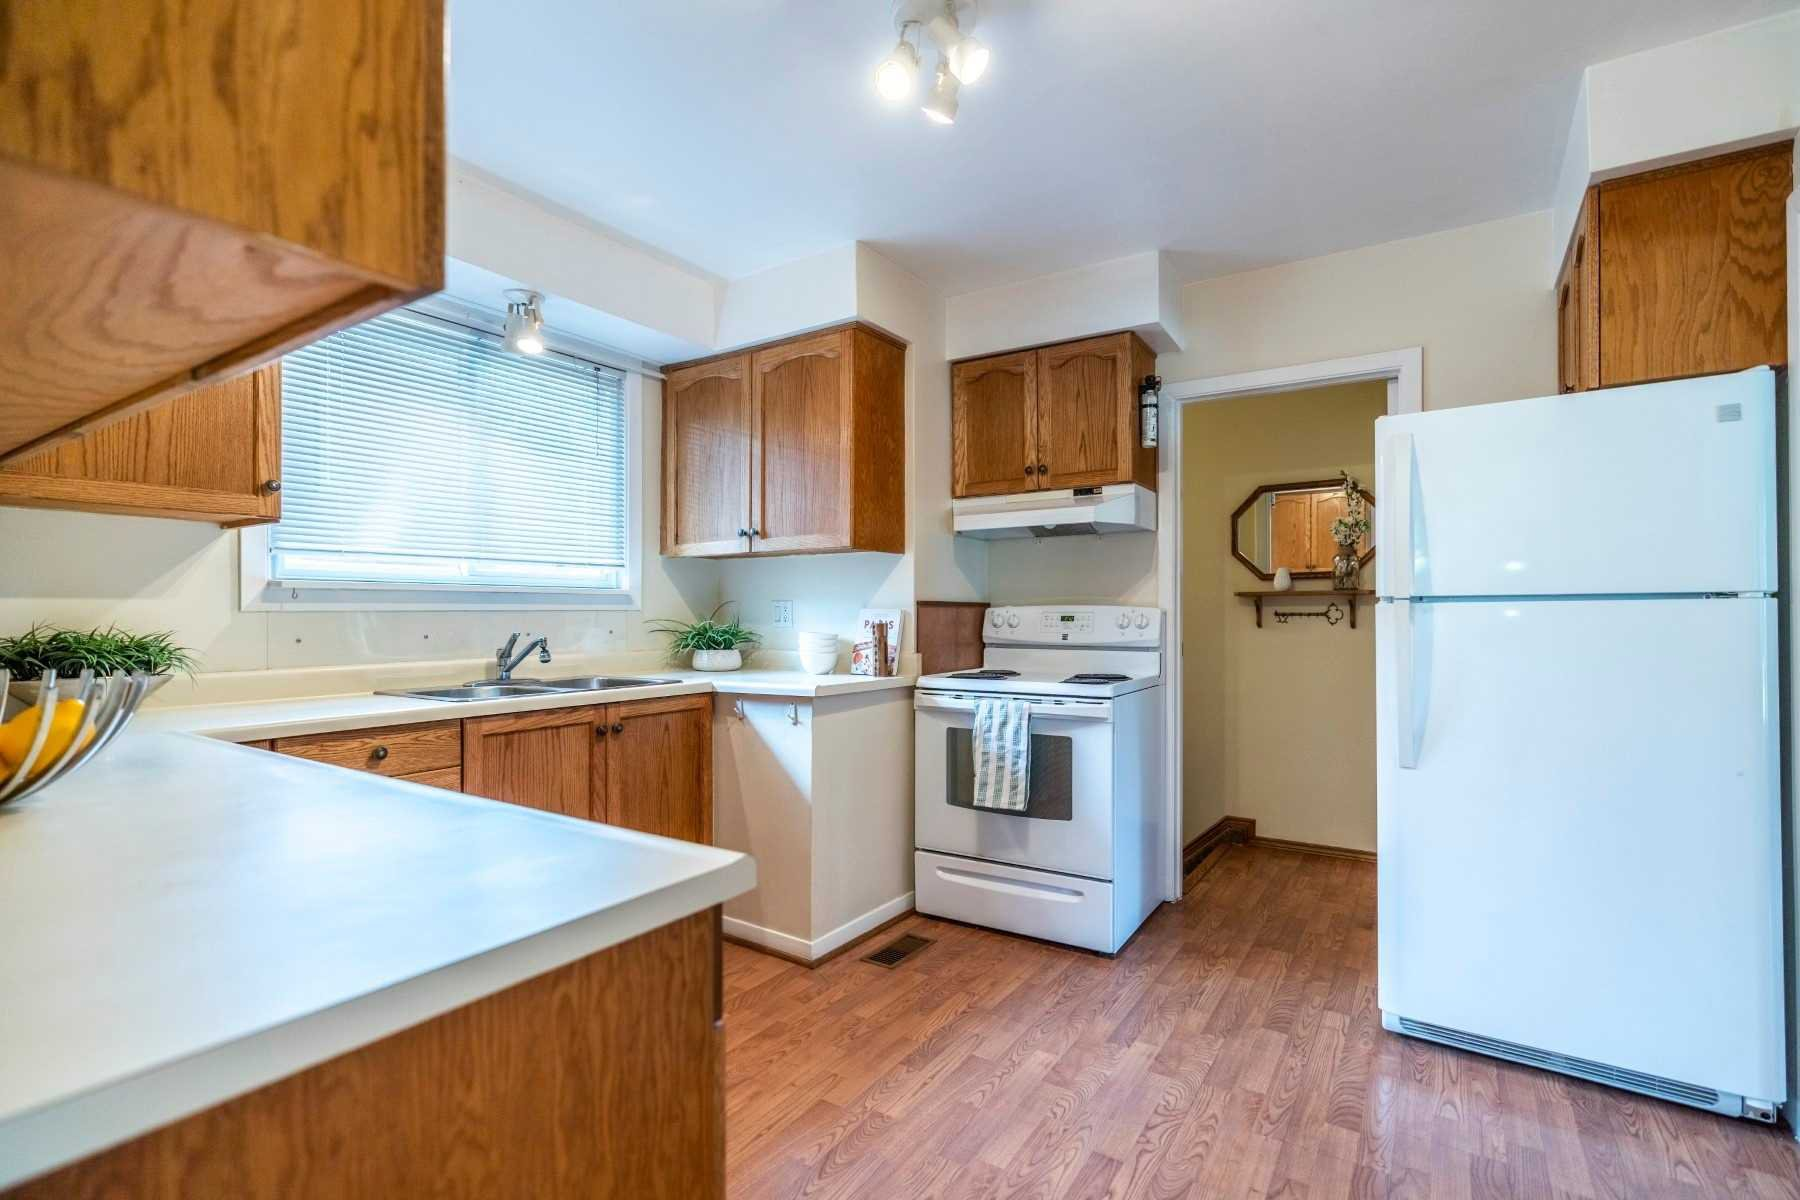 Photo 9: Photos: 1140 Northridge Street in Oshawa: Centennial House (Bungalow) for sale : MLS®# E4571459